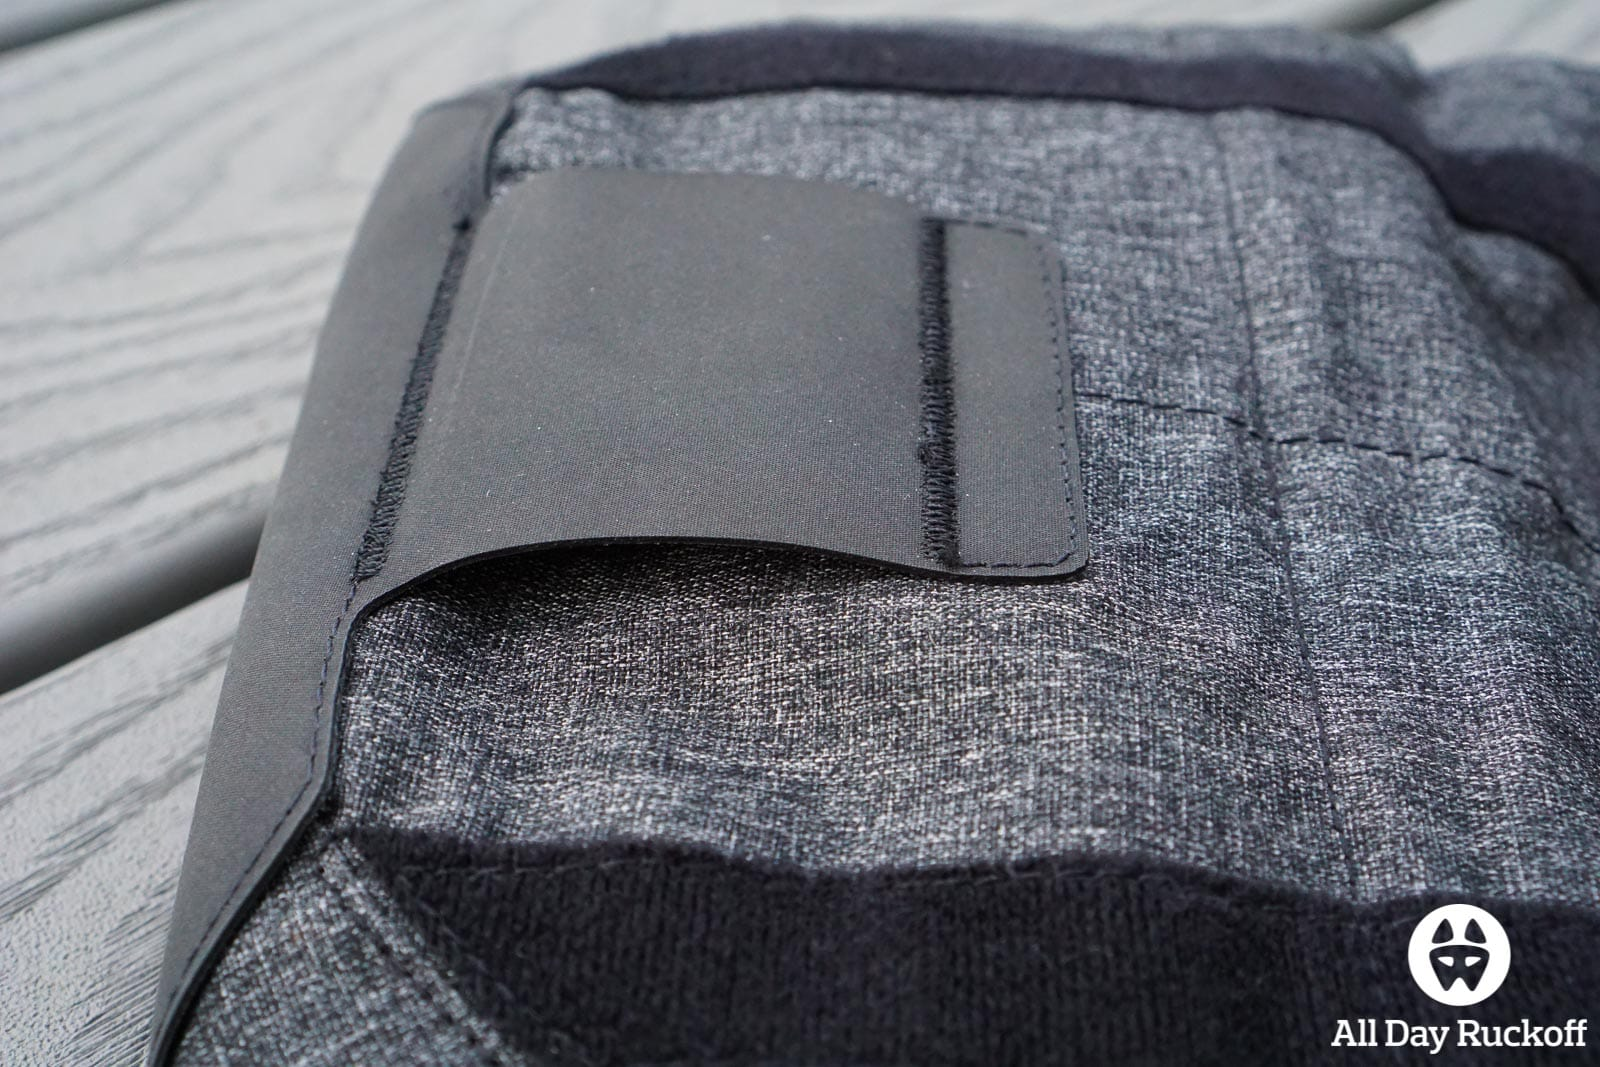 Peak Design Field Pouch - Capture Clip Attachment